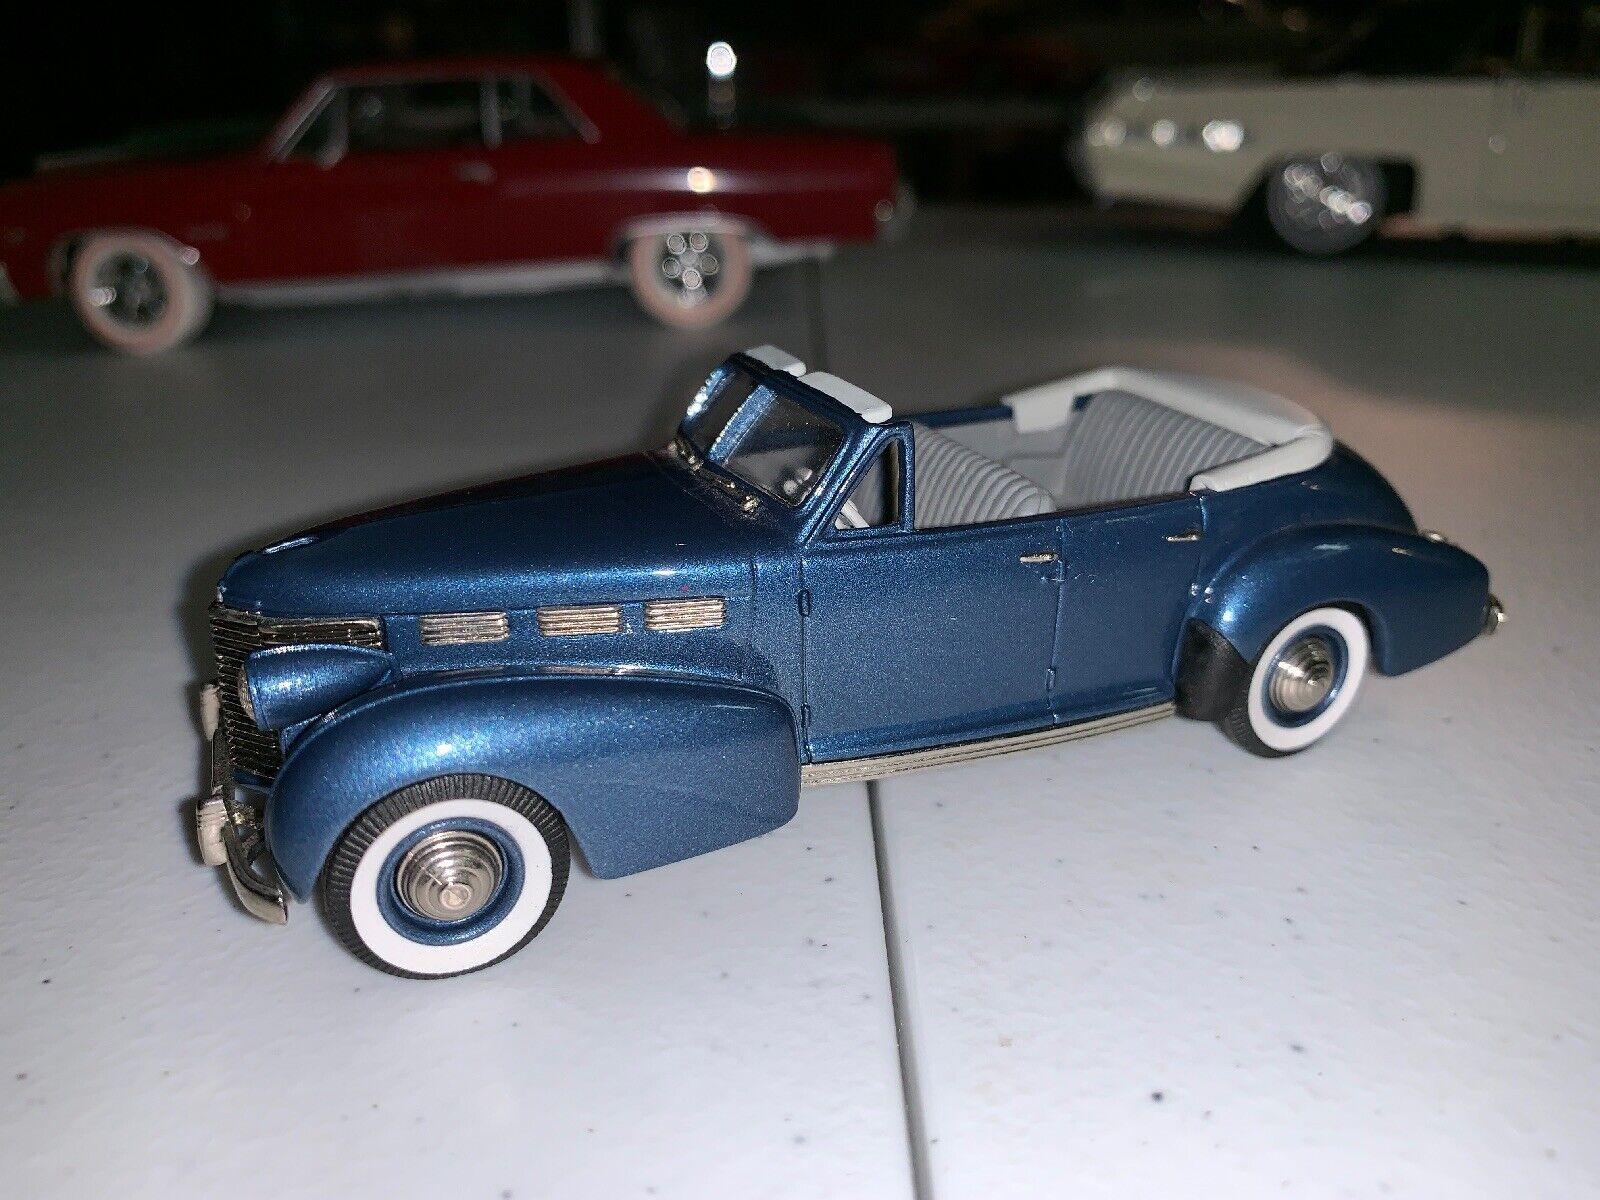 Brooklin Brooklin Brooklin Models 1 43 Scale FS05 - 1938 Cadillac Sixty Special  - Metallic bluee  2cf